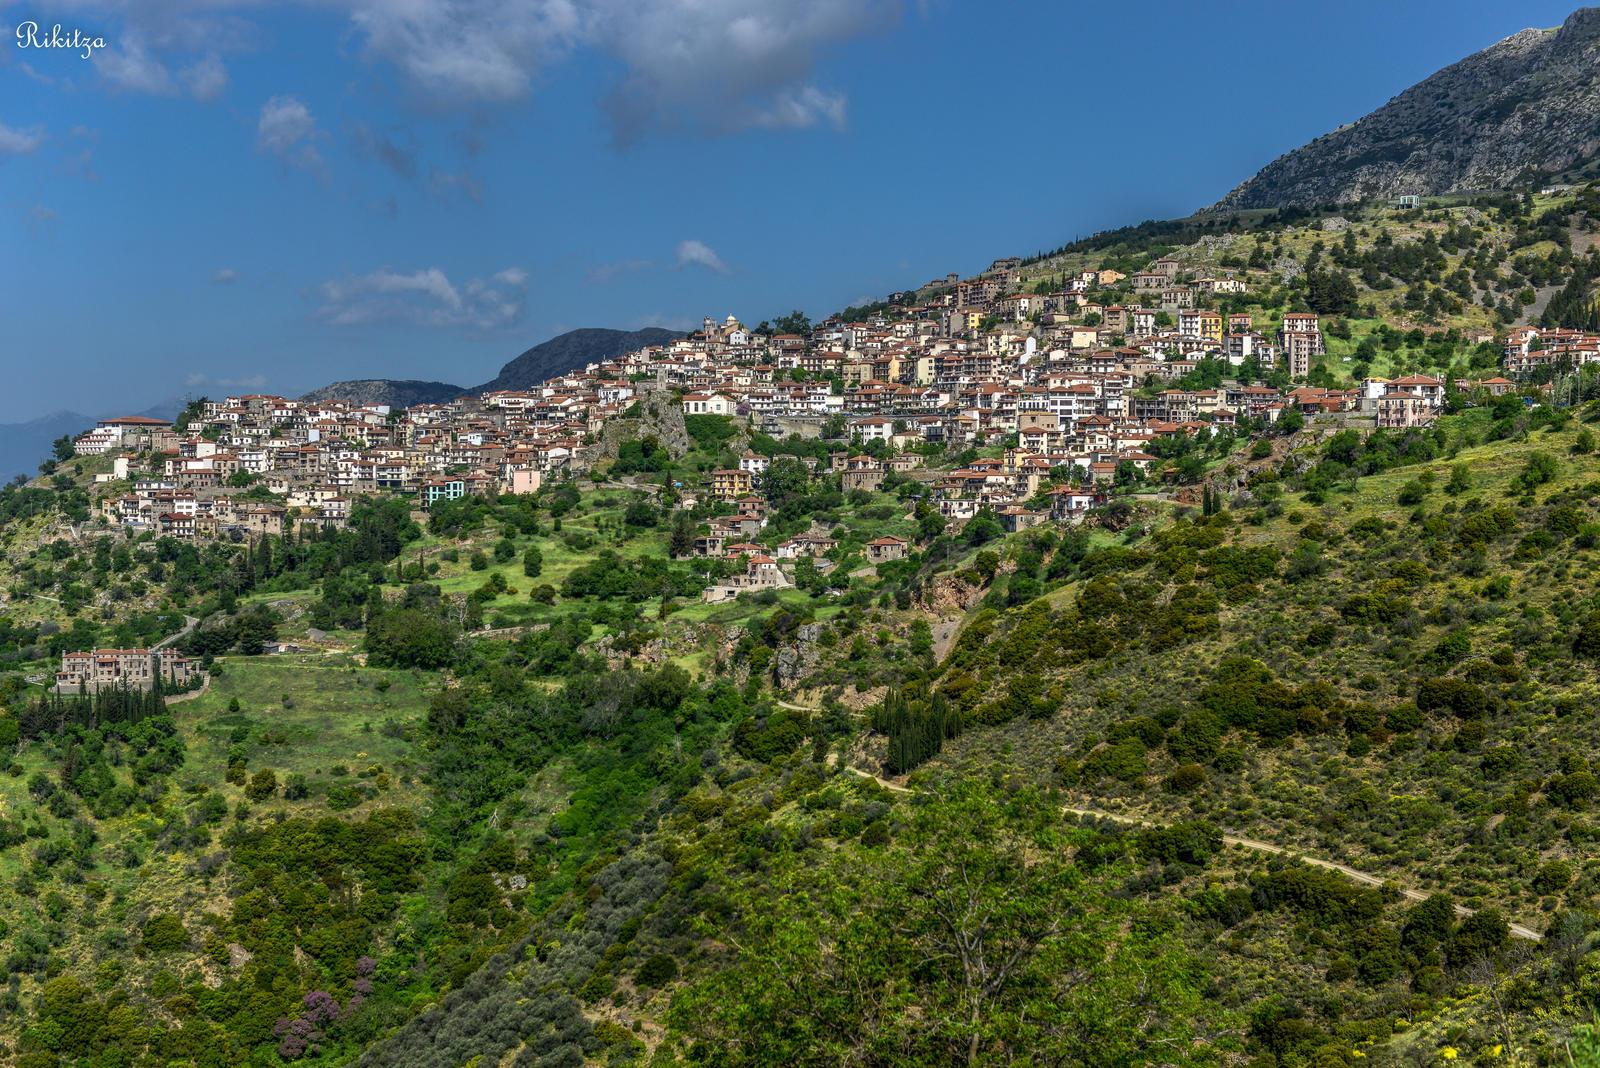 Delphi Greece  city images : Arachova Delphi GREECE by Rikitza on DeviantArt